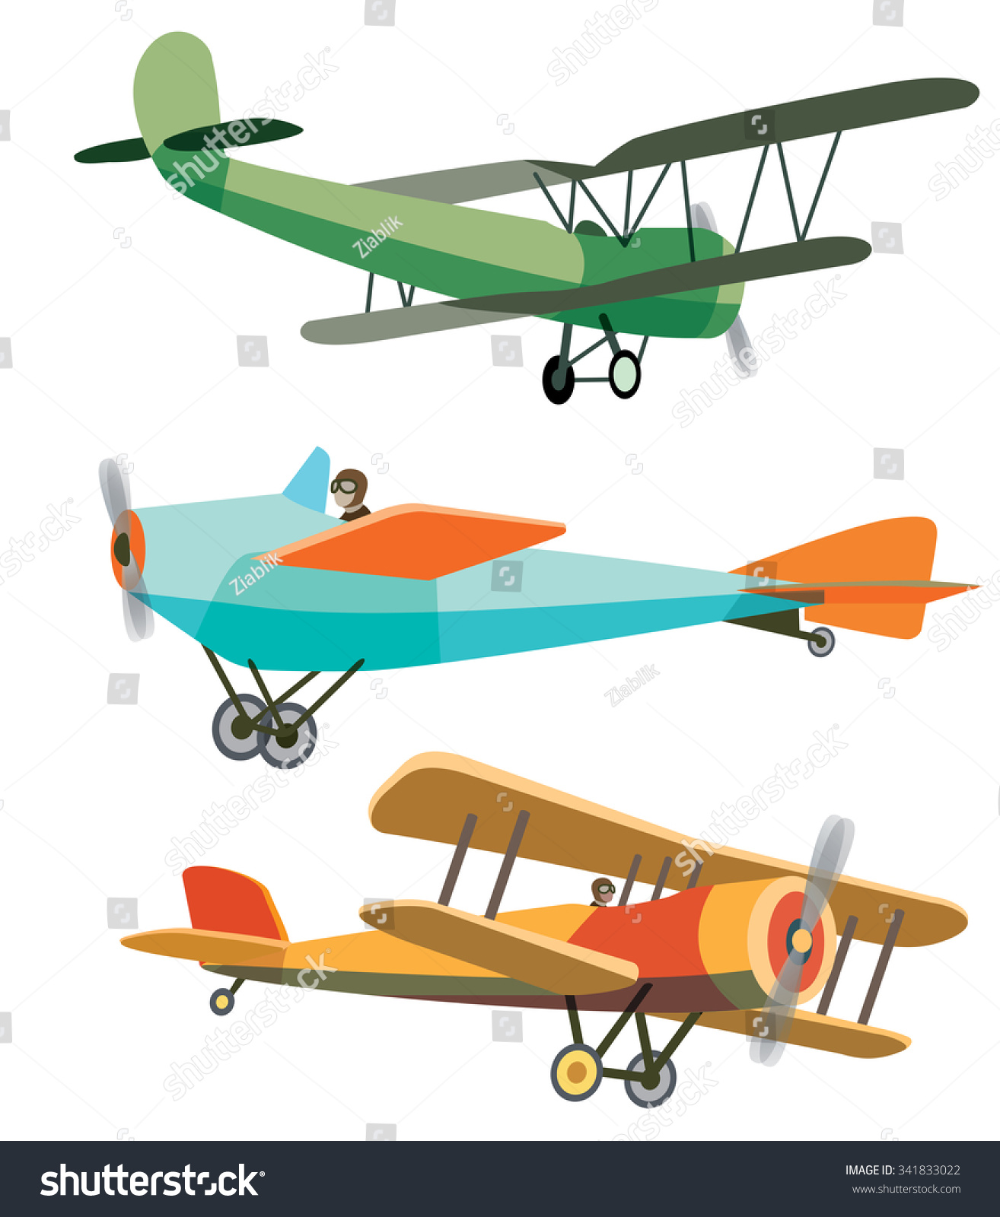 Vintage Airplane Images Stock Photos Vectors Shutterstock In 2020 Airplane Illustration Airplane Vector Retro